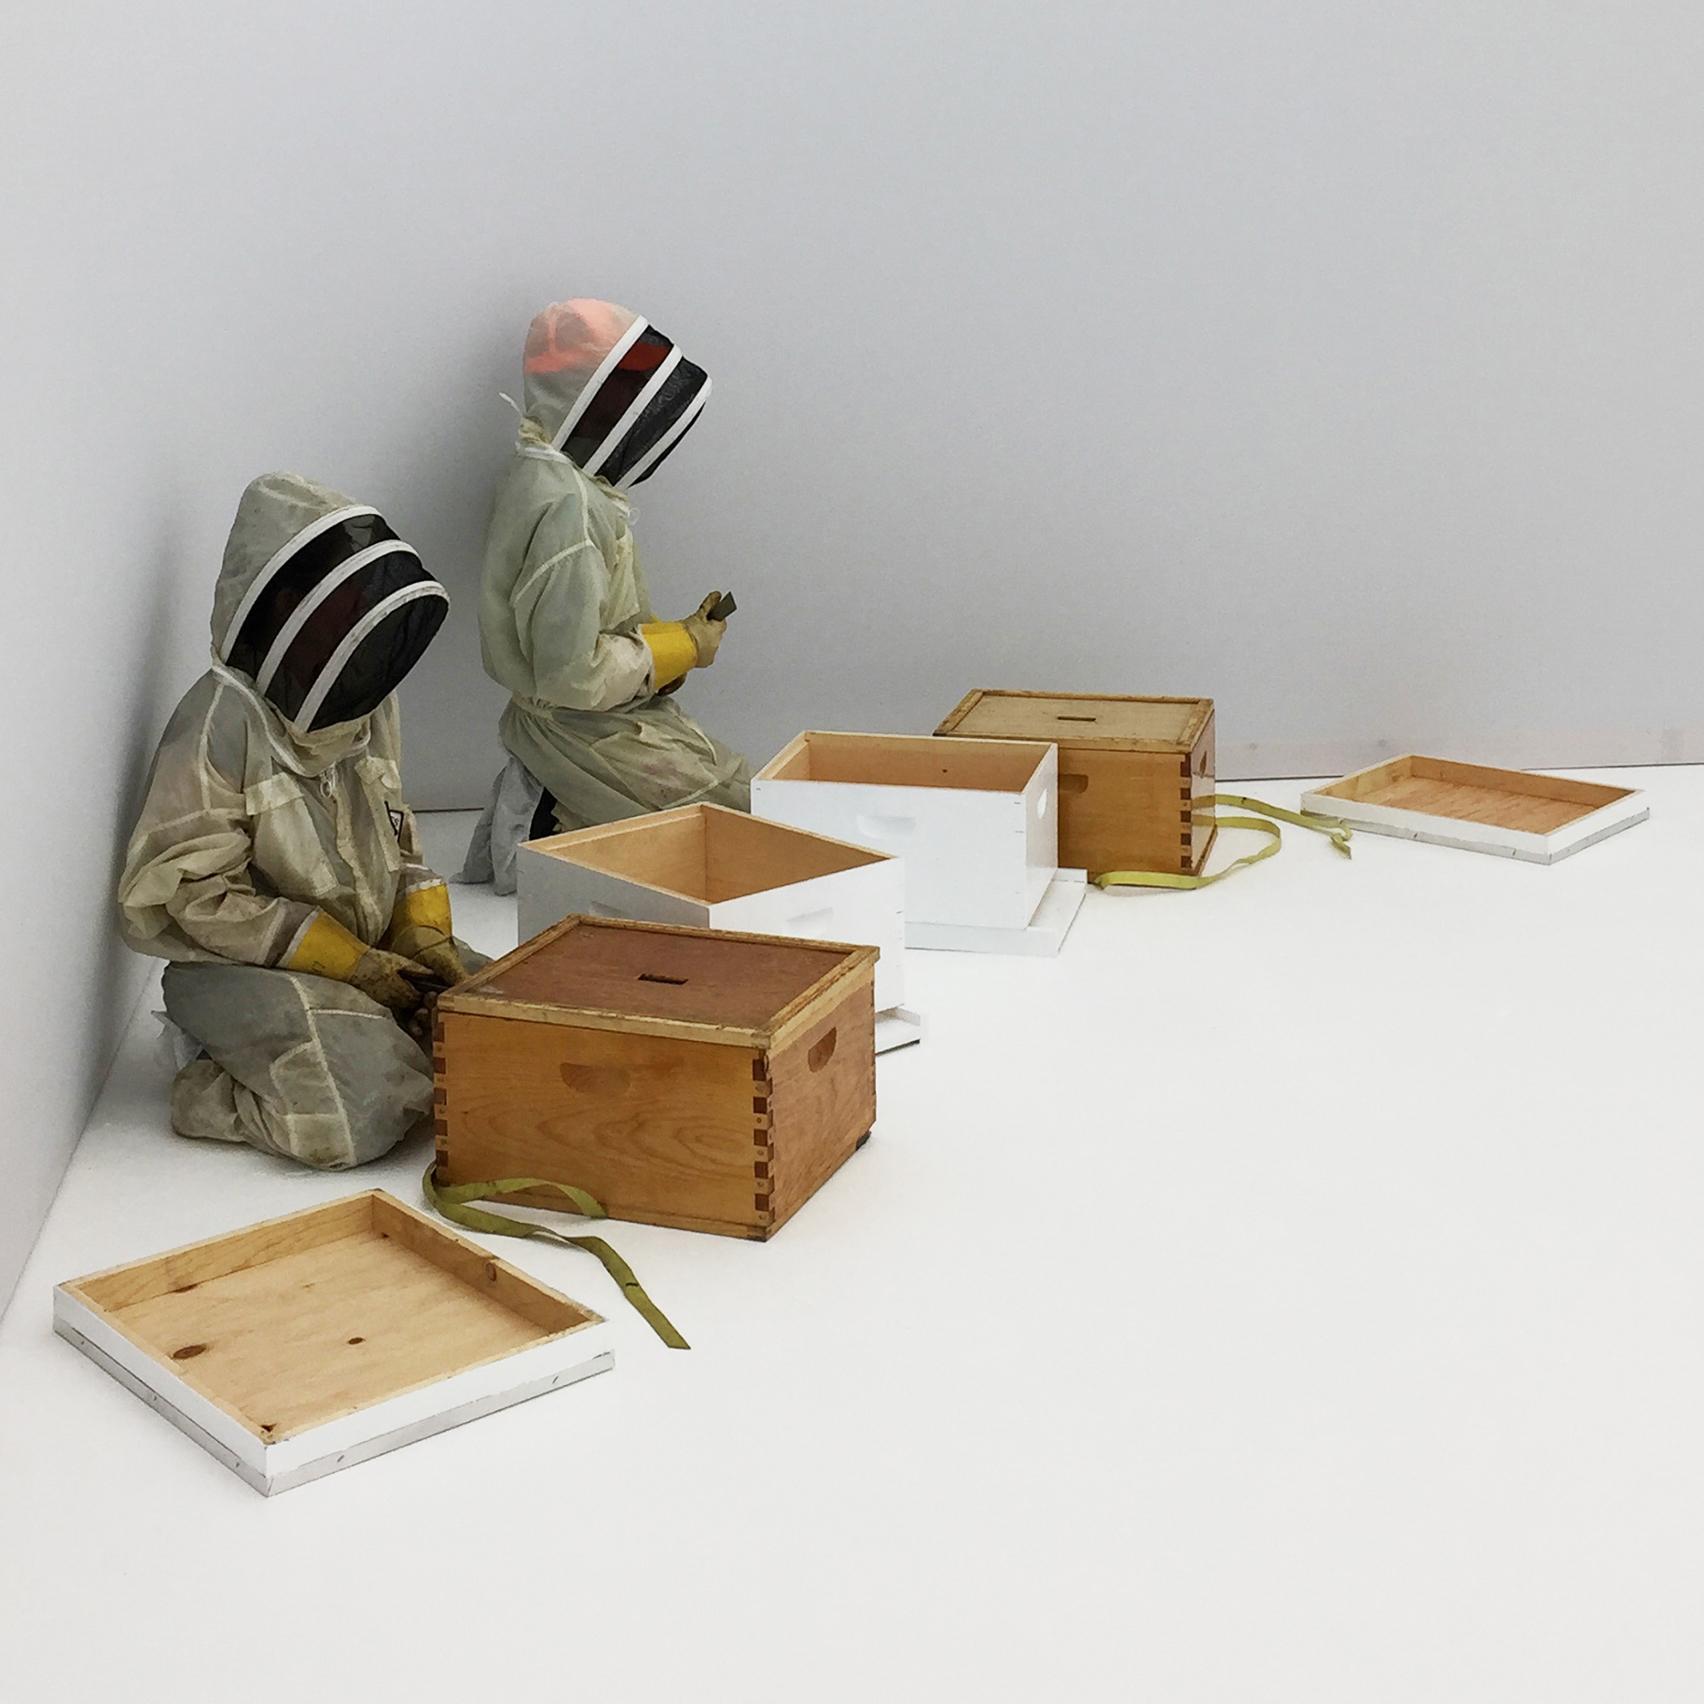 Neri Oxman synthetic apiary